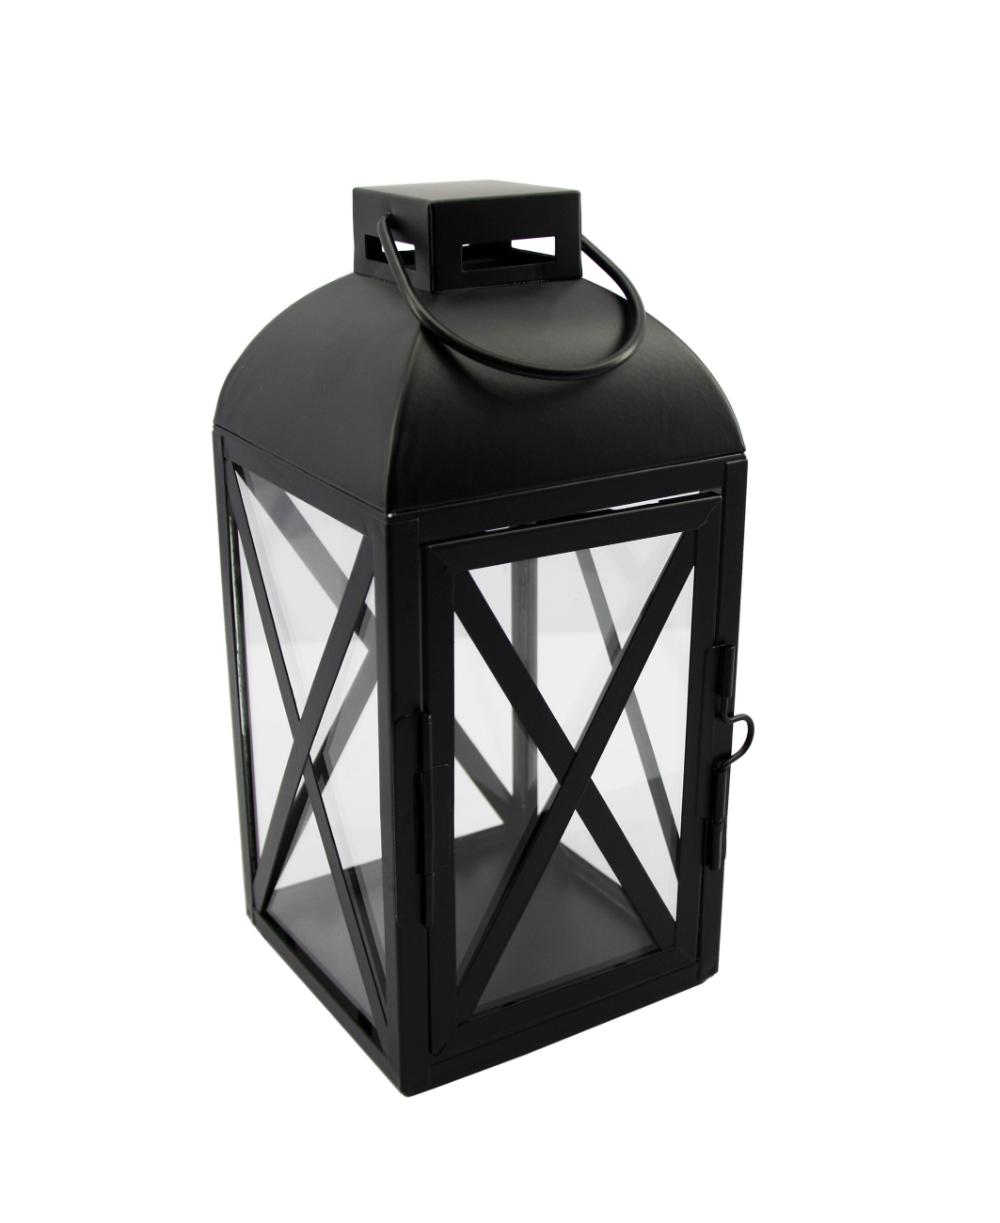 81d8a9d822650f4b73b638a1fa3f16e8 - Better Homes And Gardens Farmhouse Large Lantern Rustic Finish